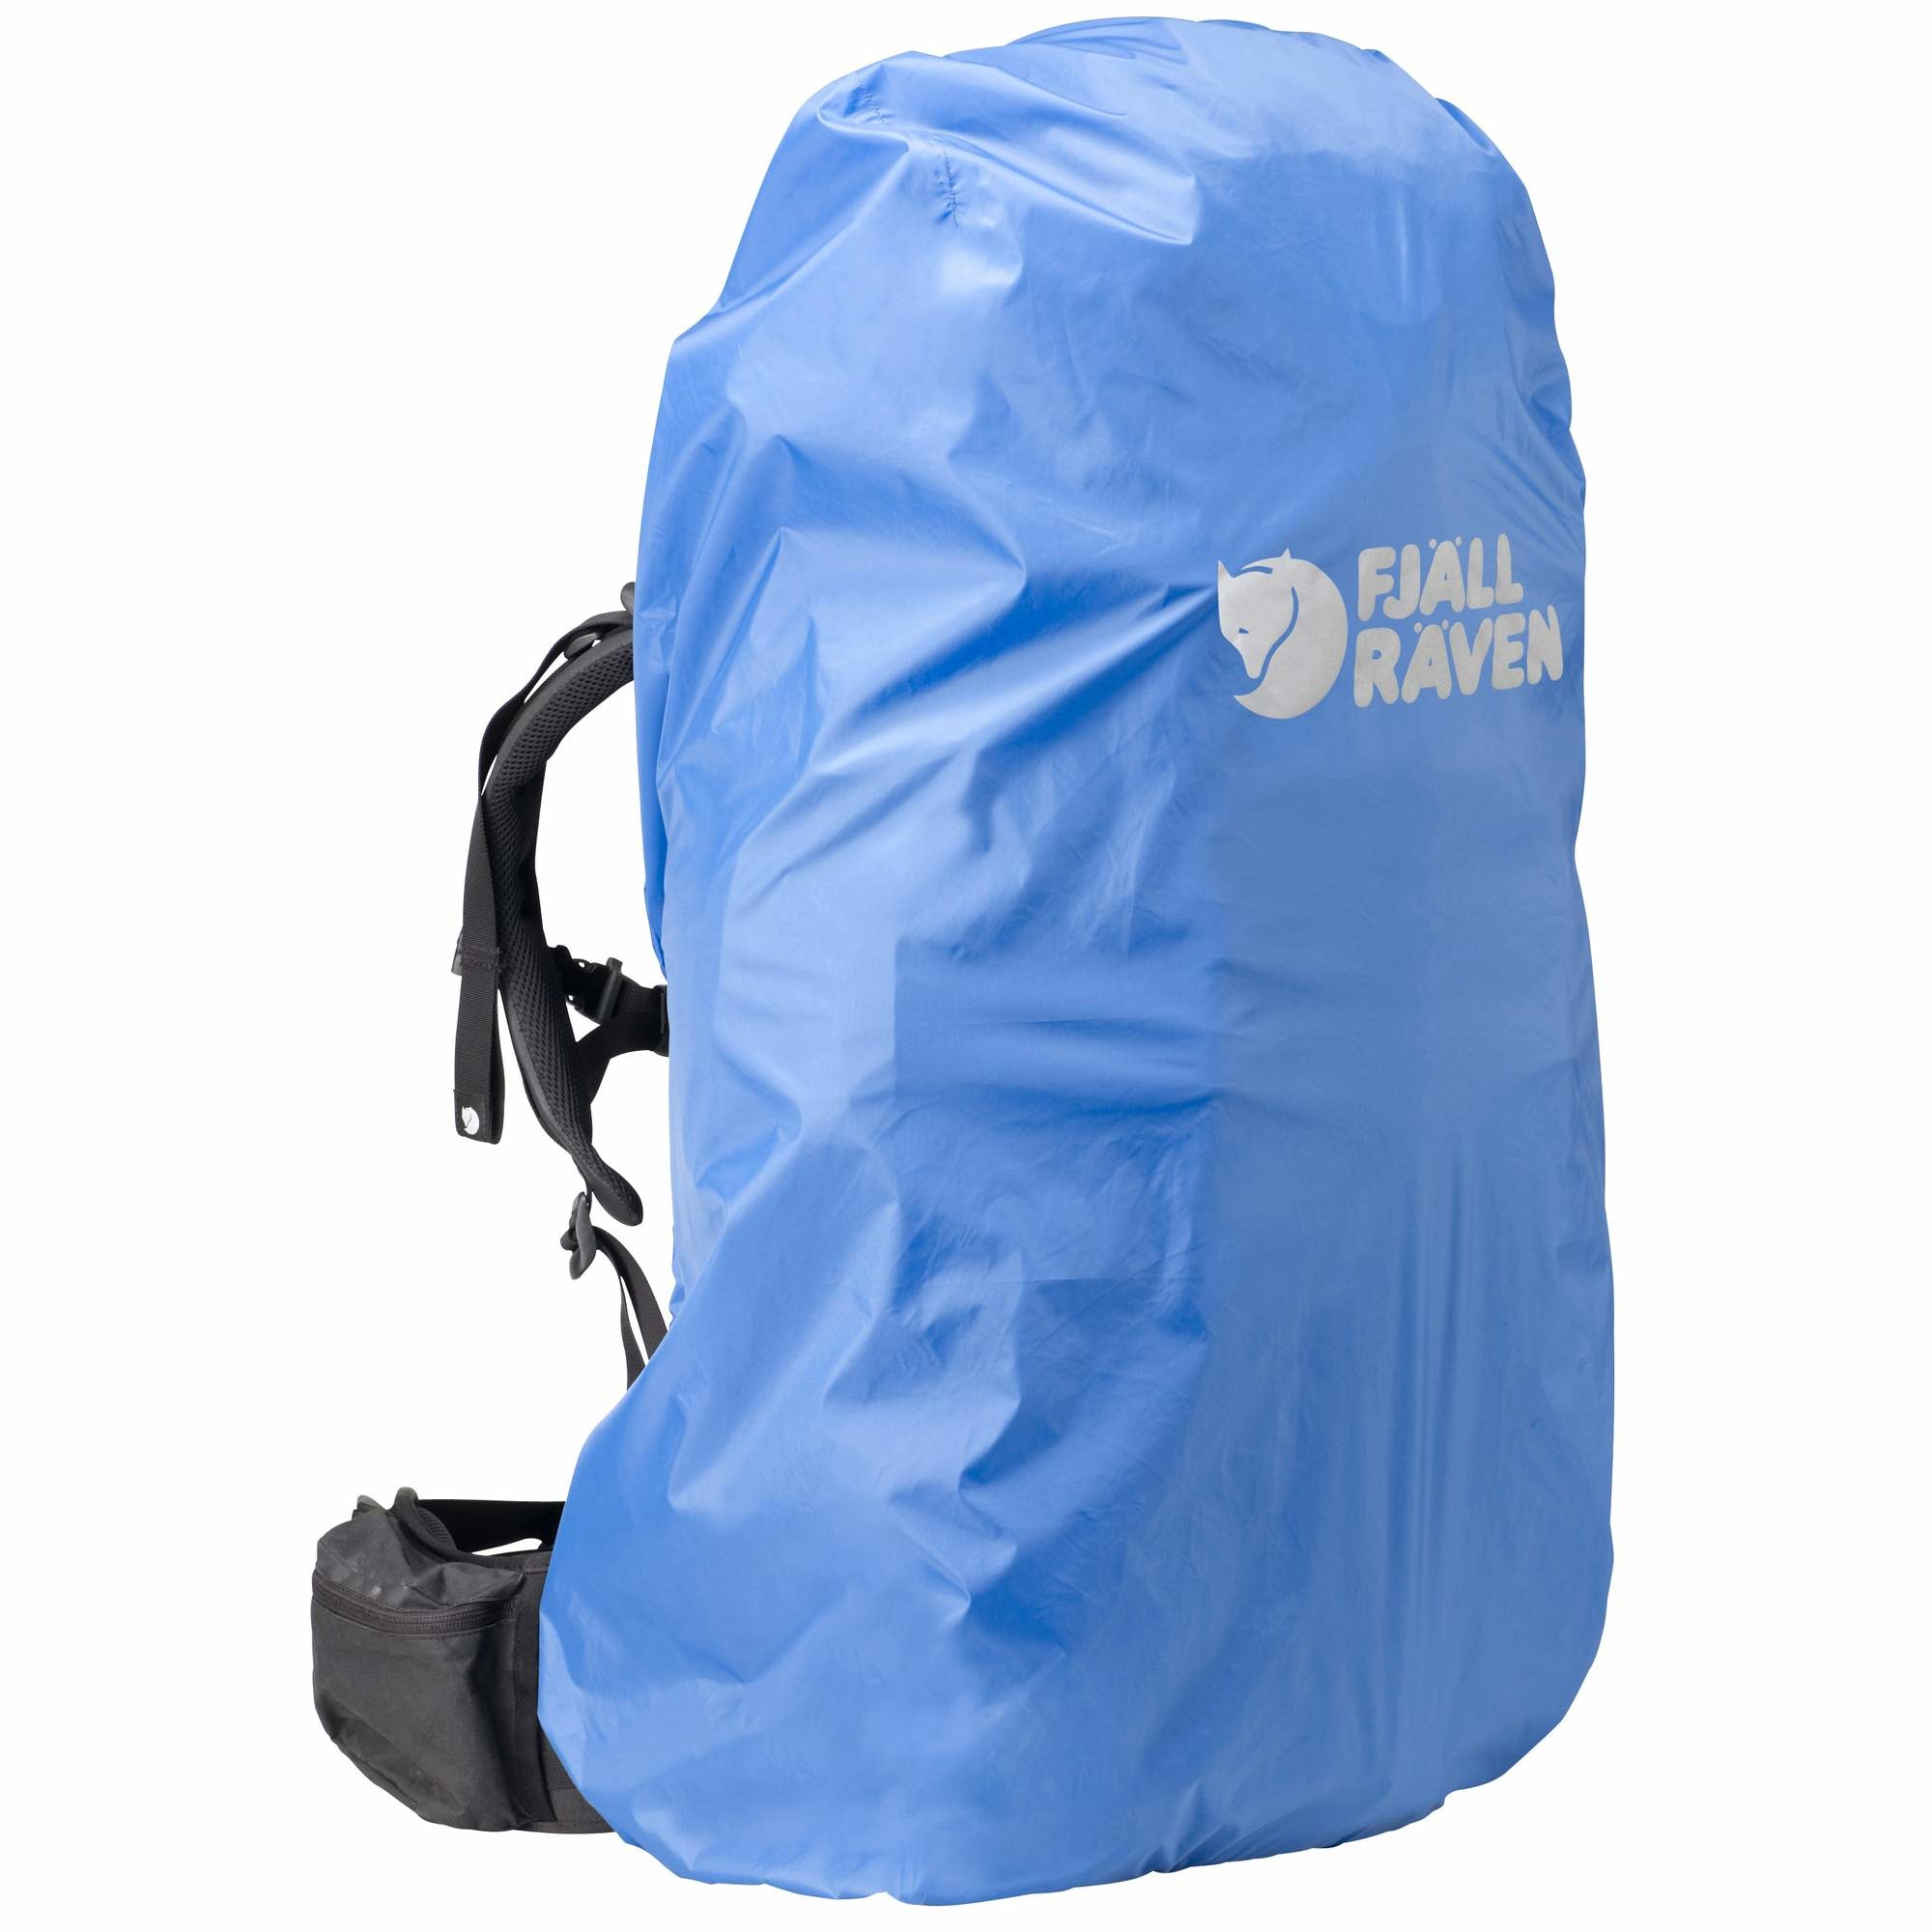 Fjallraven Rain cover 40-55l regenhoes backpack- UN Blue